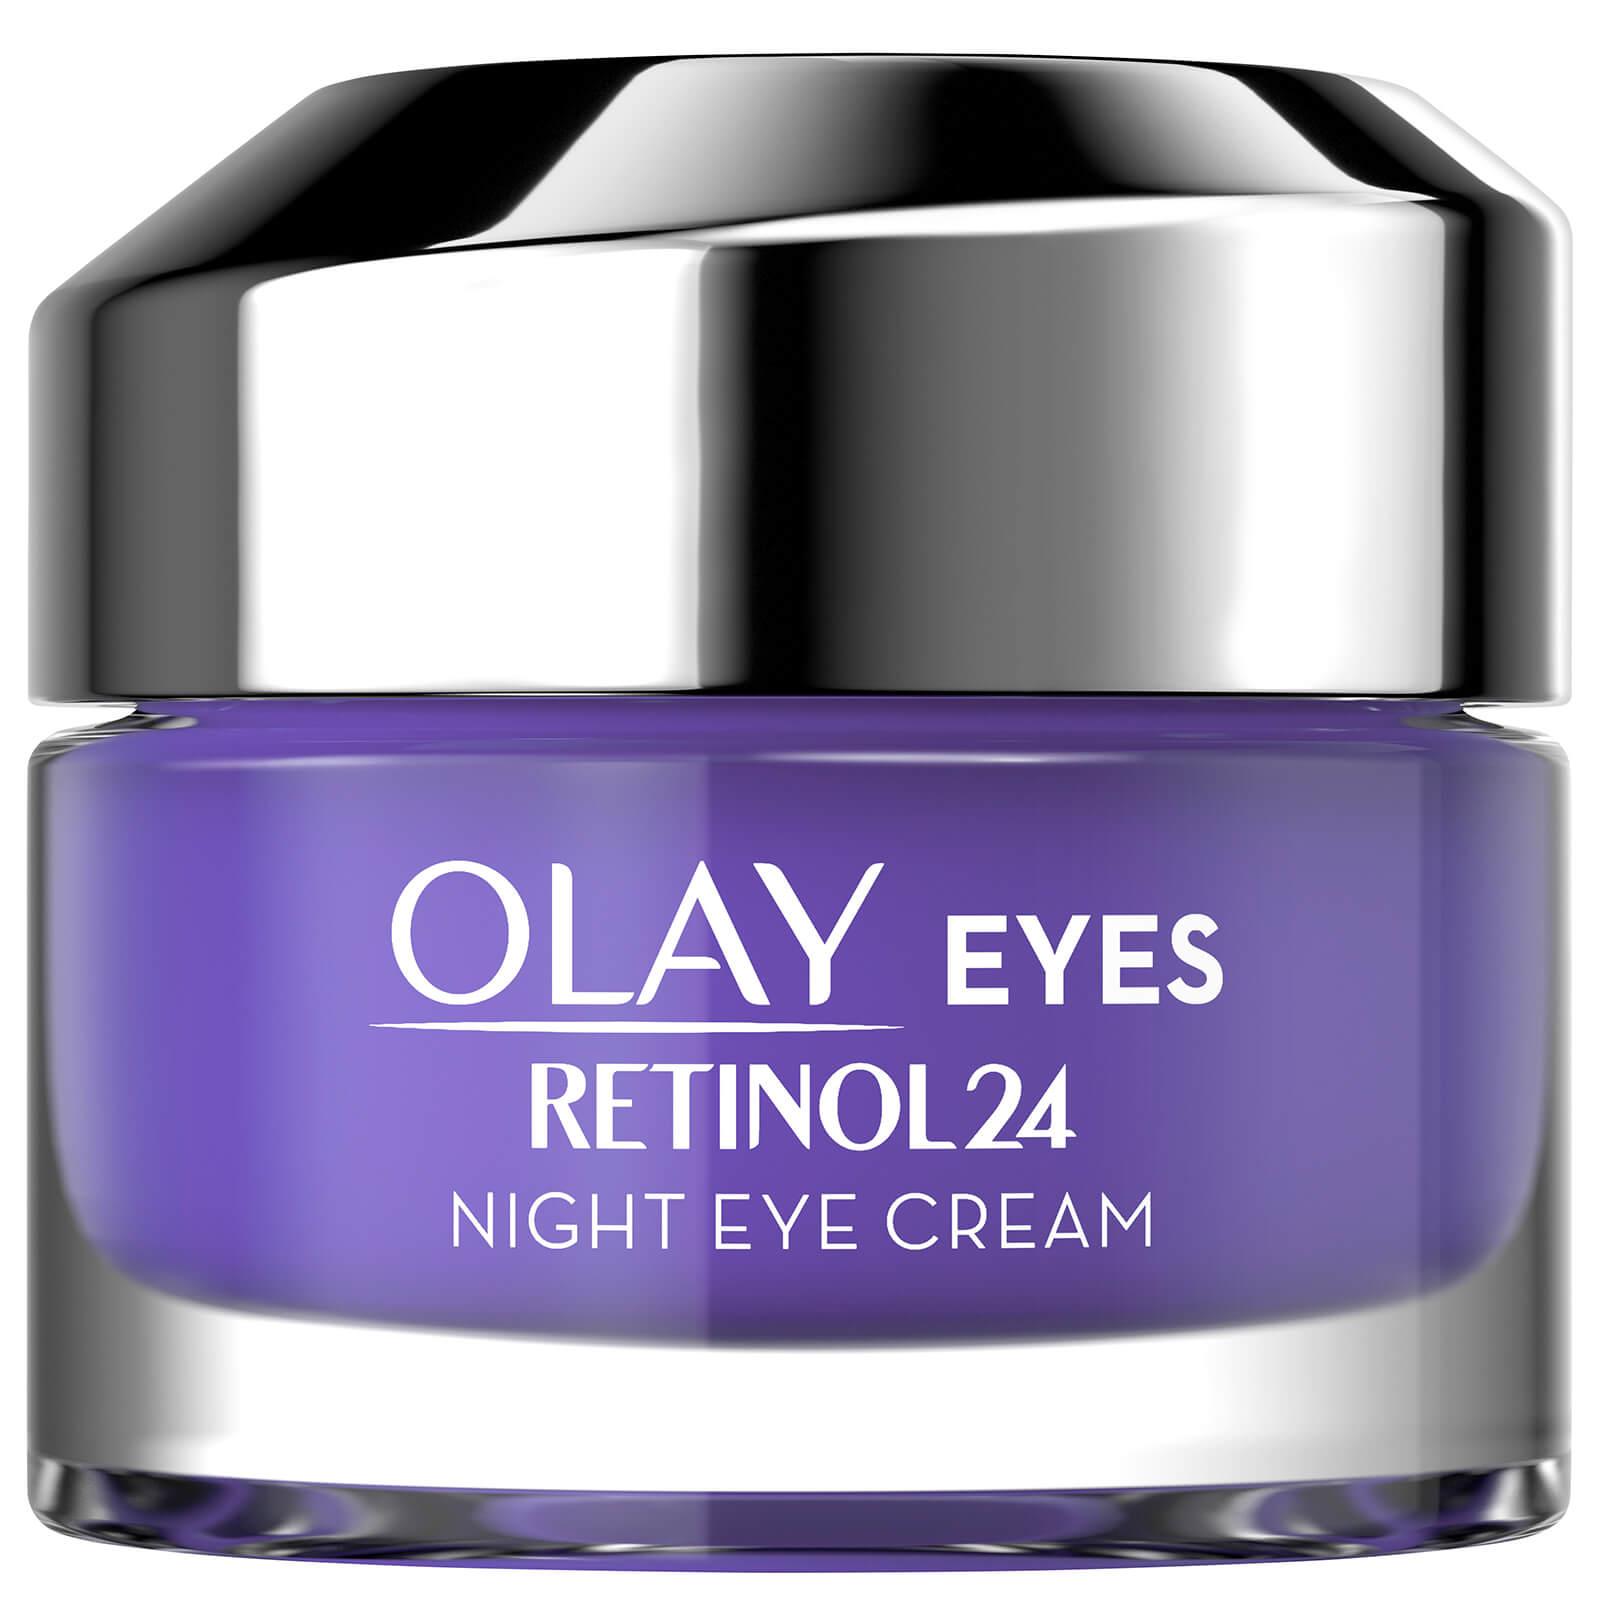 Купить Olay Retinol 24 Fragrance Free Night Eye Cream for Smooth and Glowing Skin 15ml